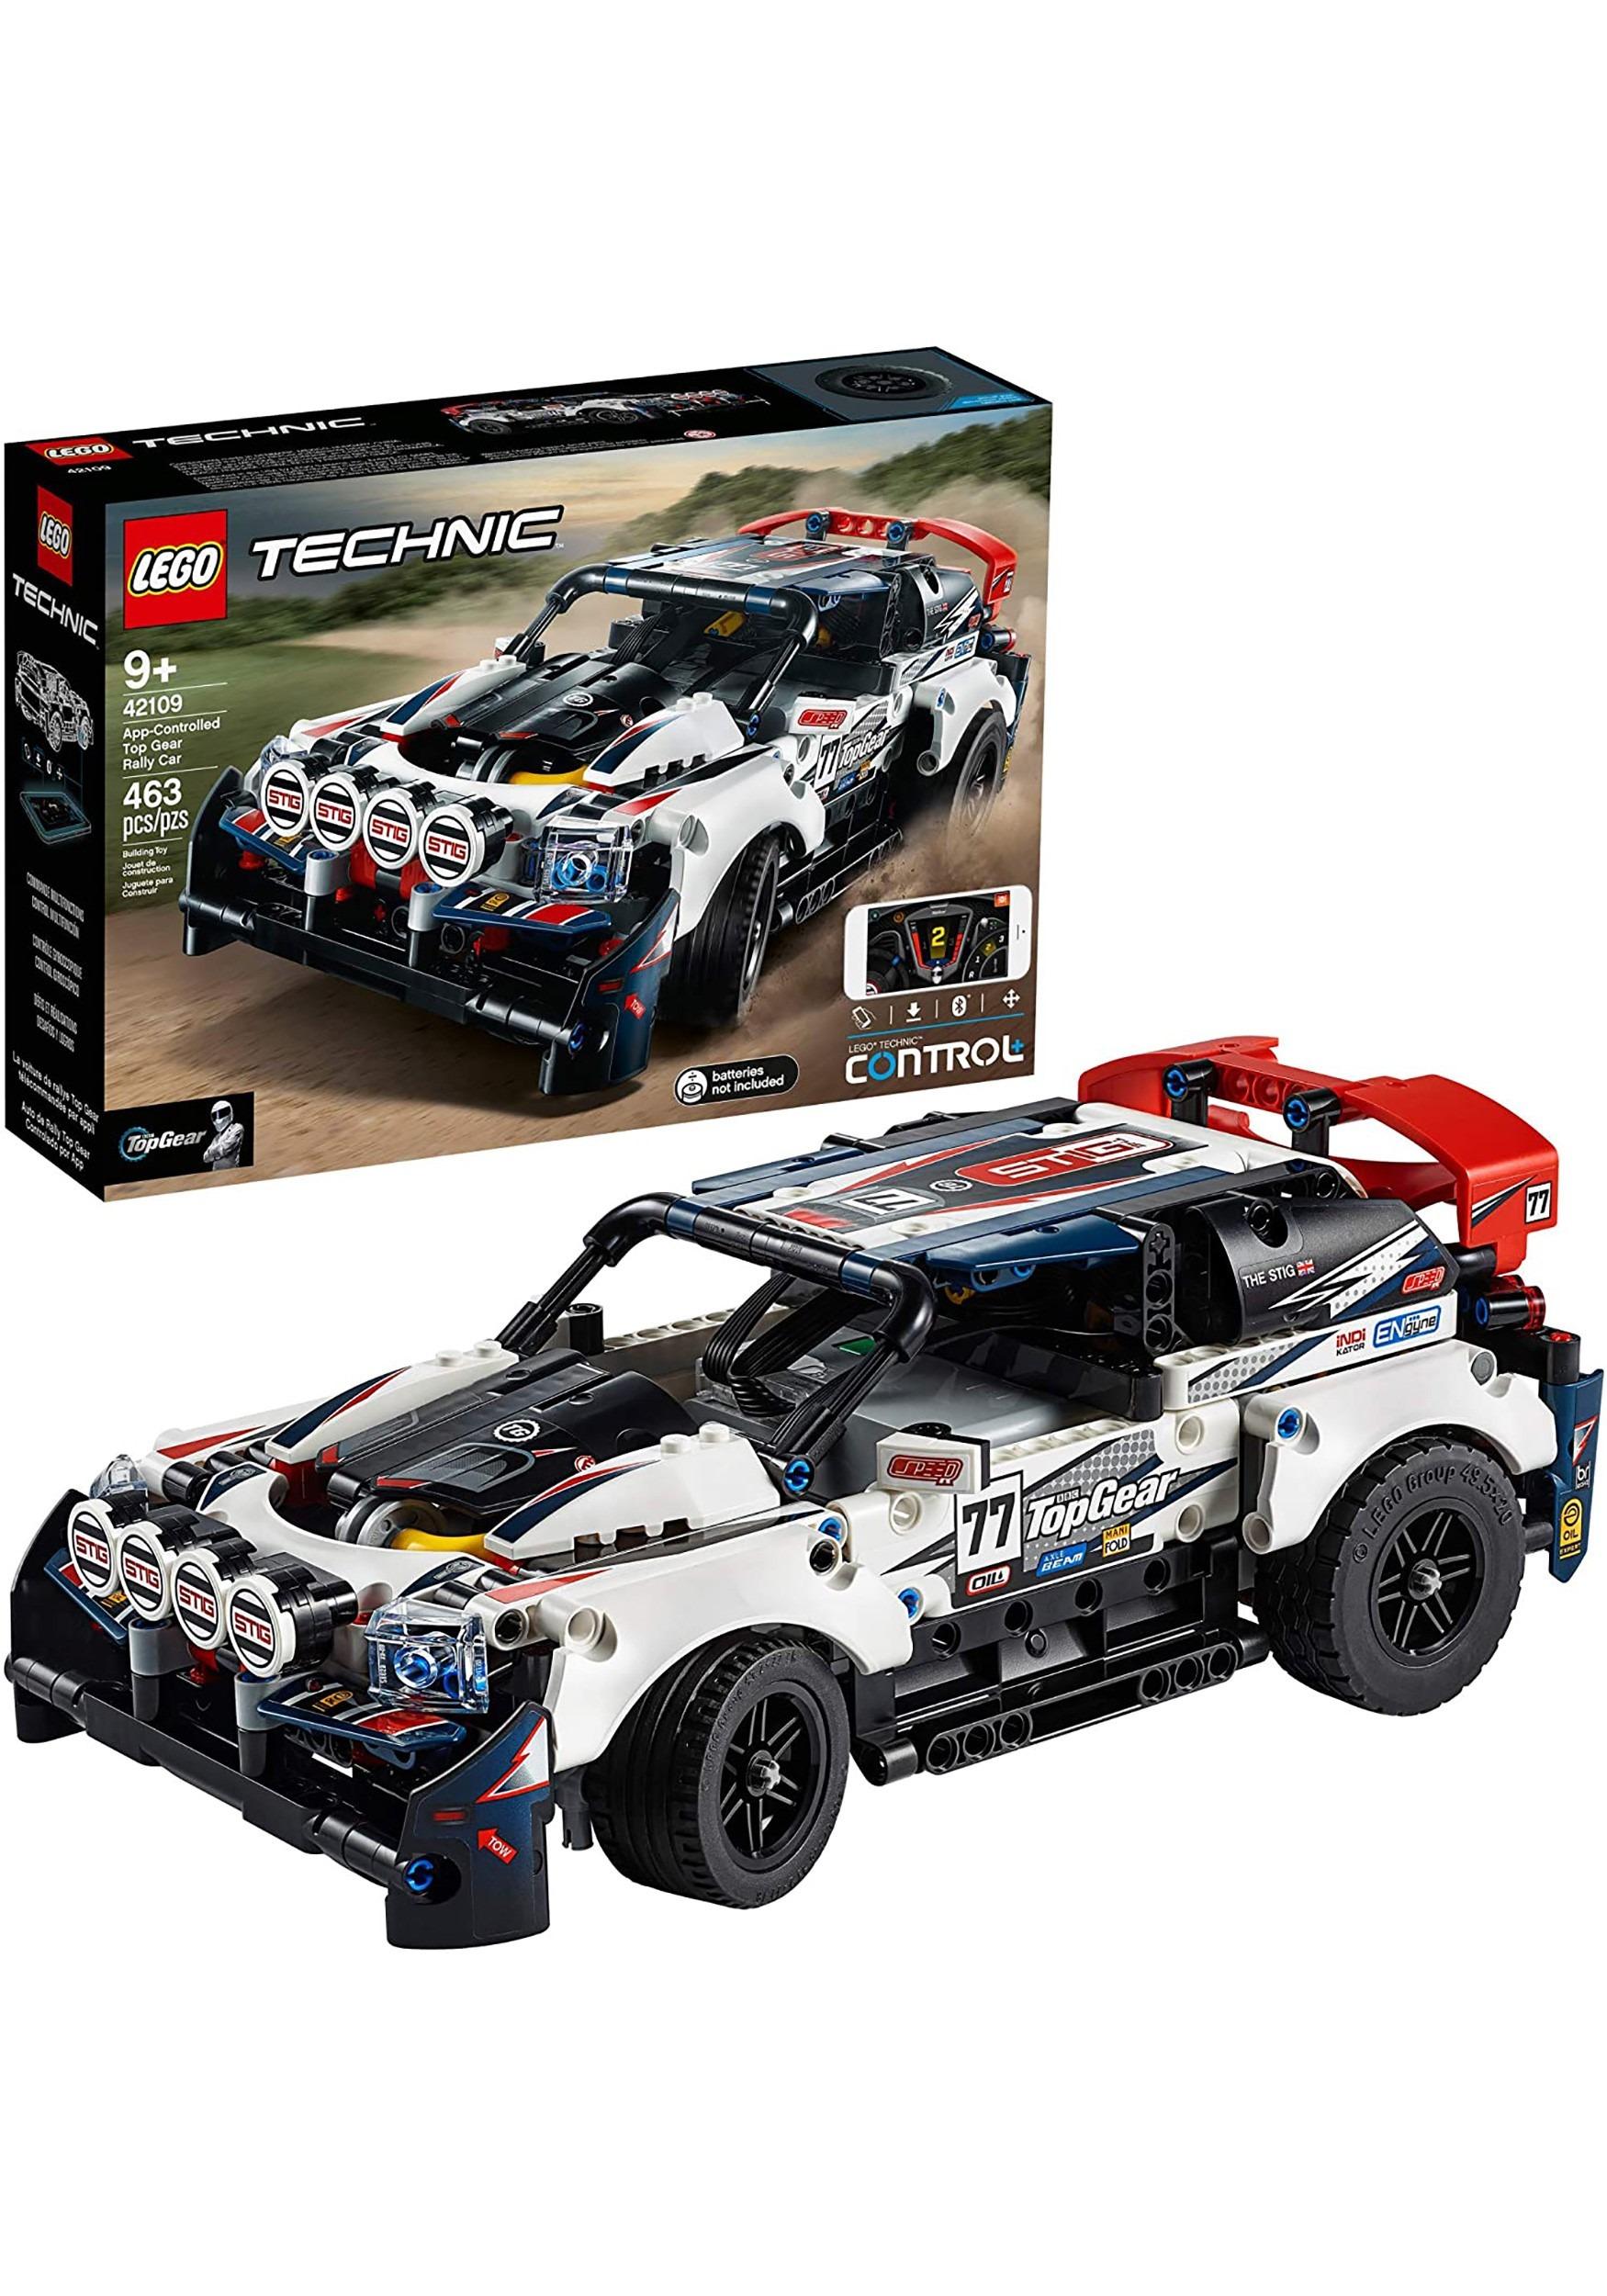 LEGO Technic App-Controlled Top Gear Rally Car Building Set